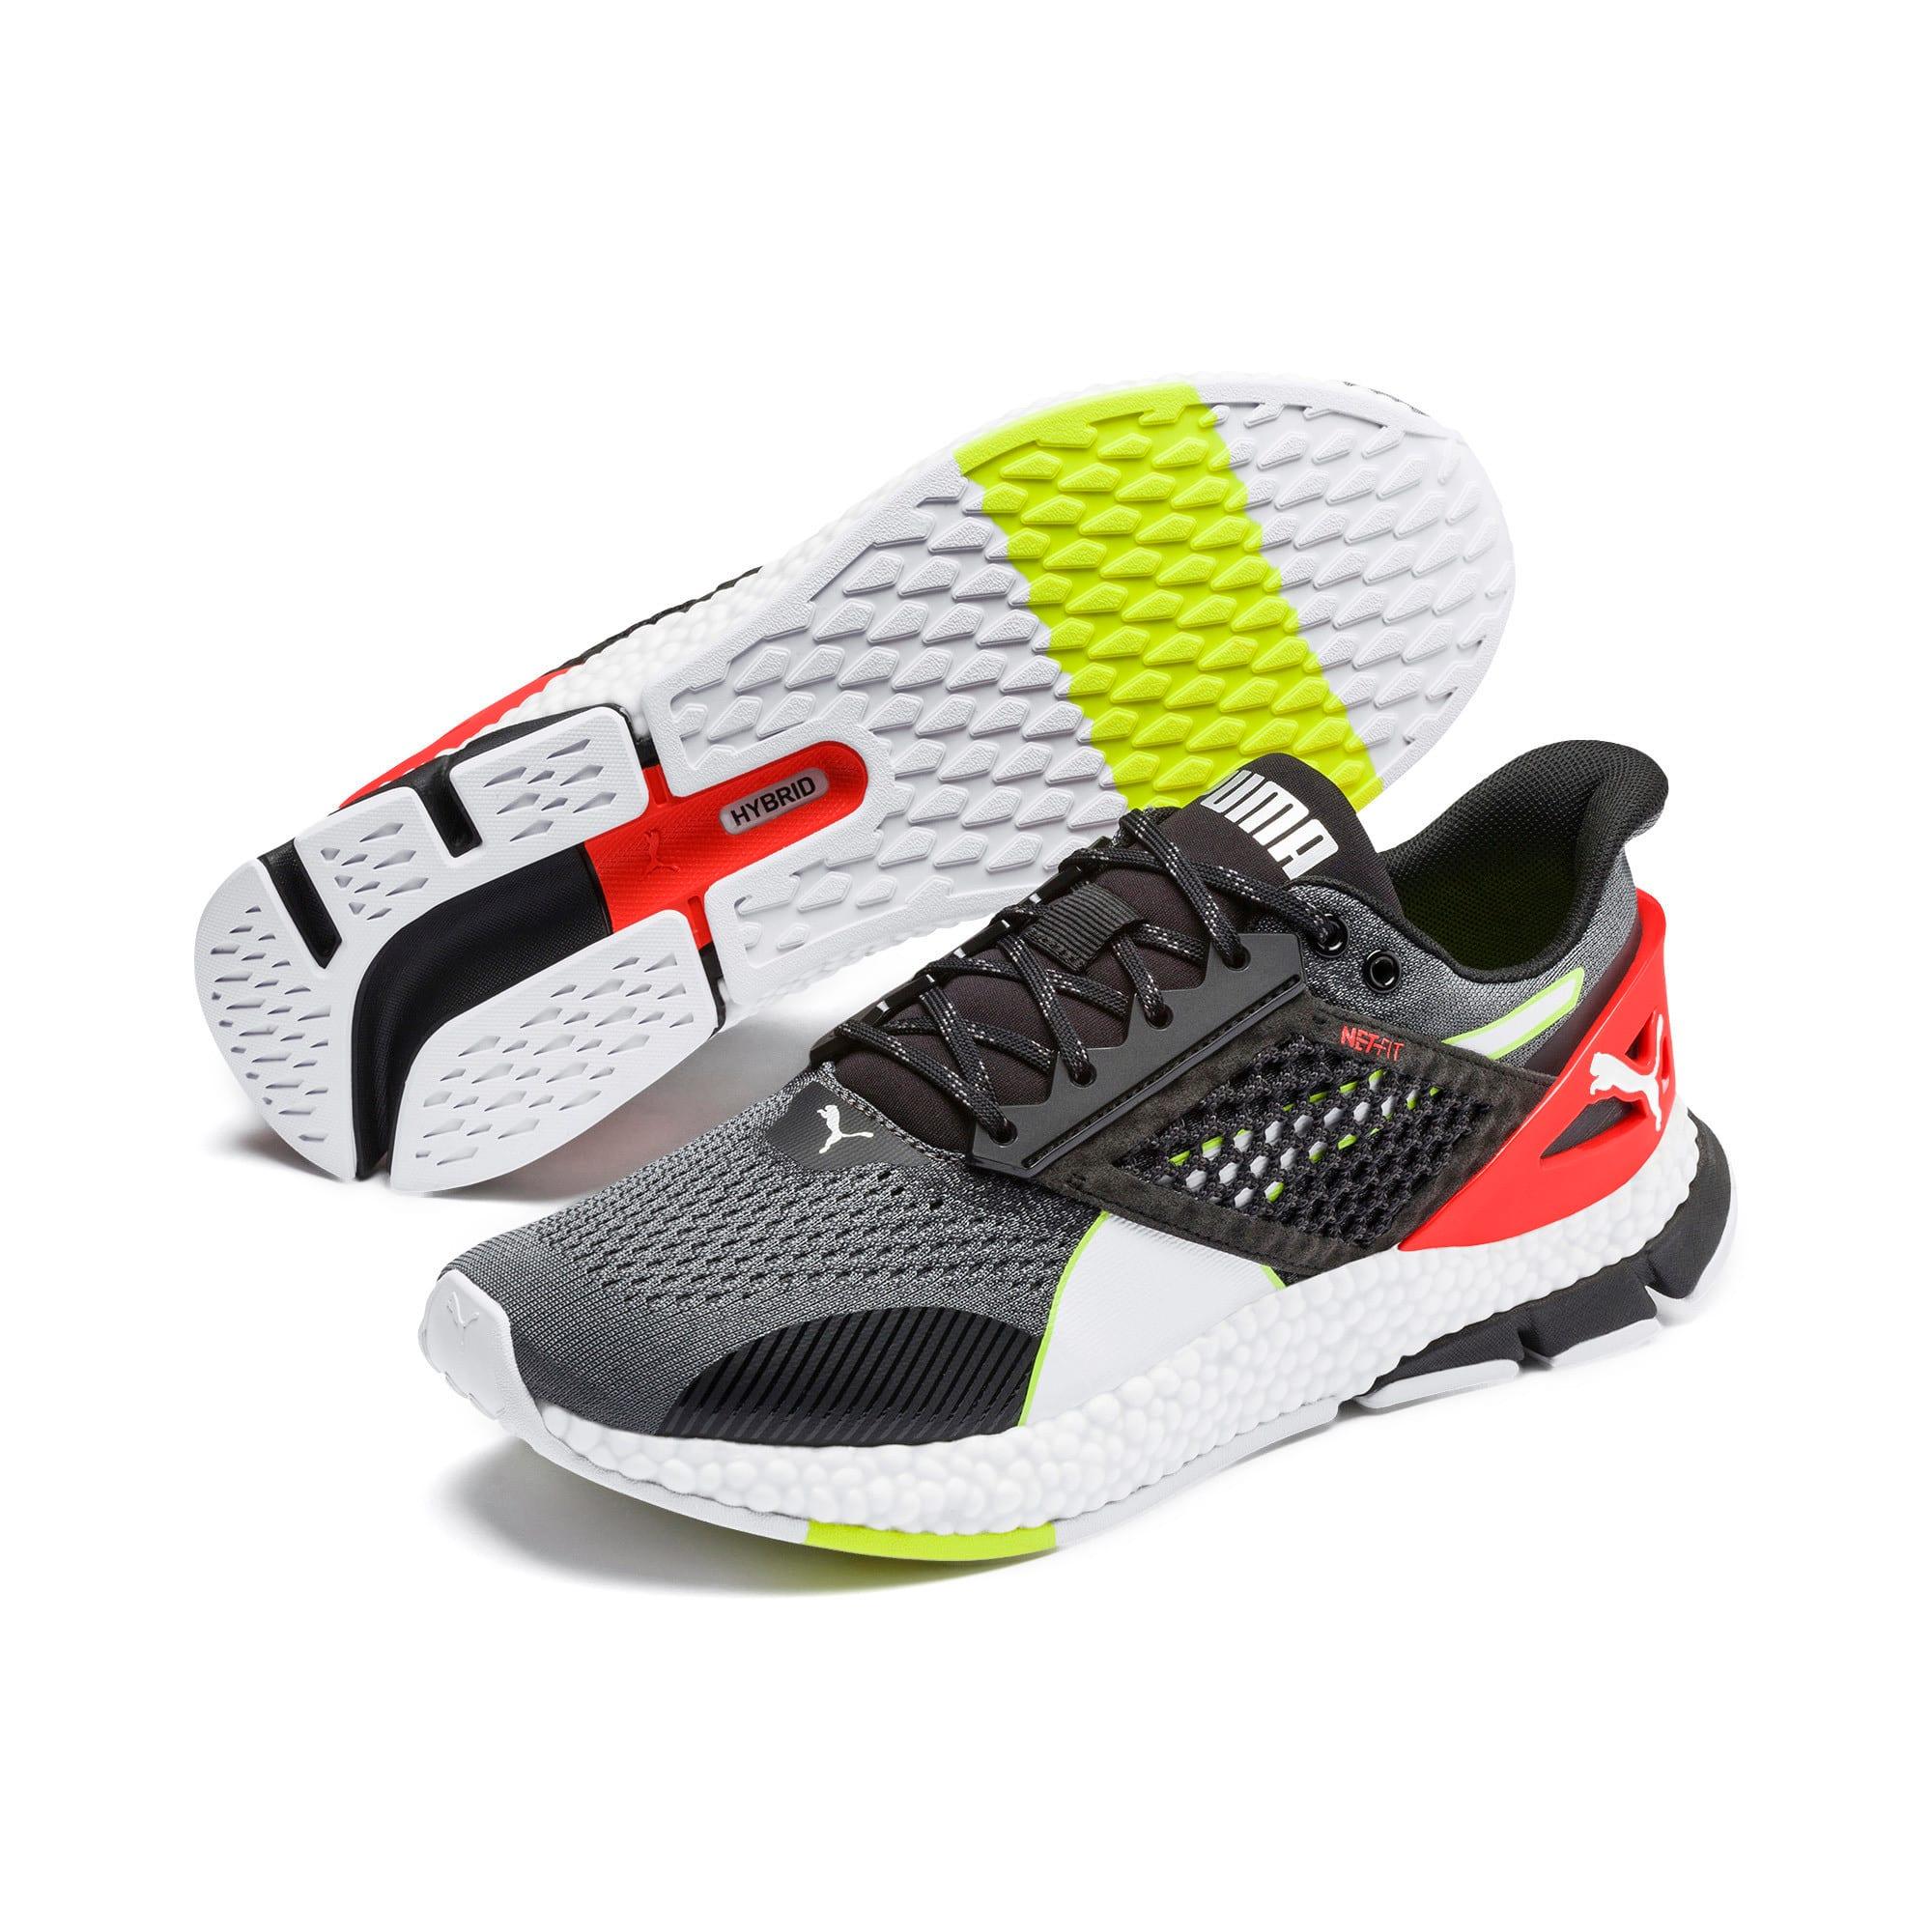 Thumbnail 3 of HYBRID Astro Men's Running Shoes, CASTLEROCK-Puma Blck-Ngy Red, medium